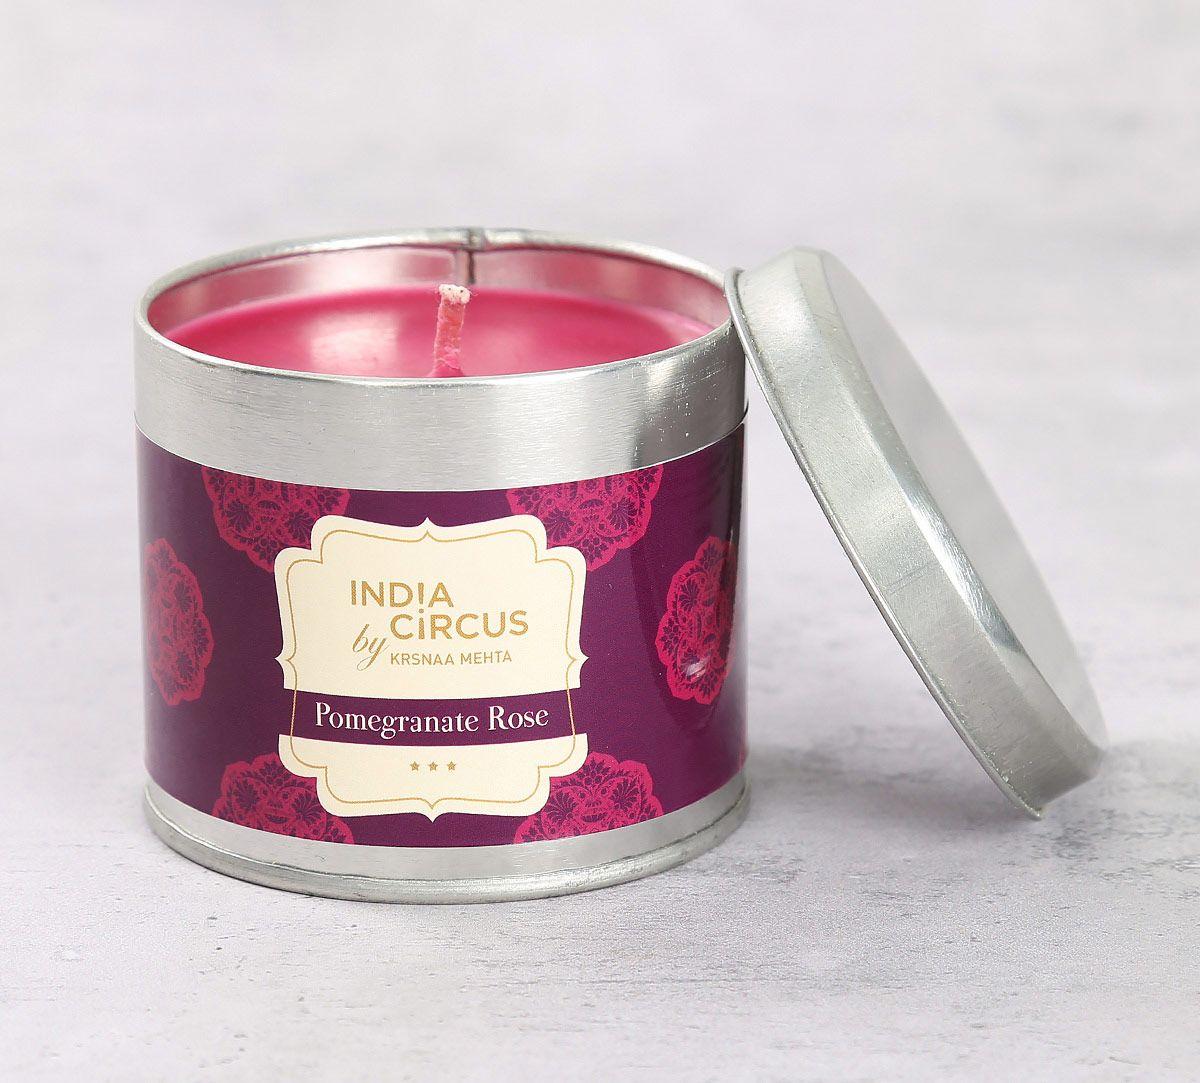 India Circus Pomegranate Rose Tin Candle